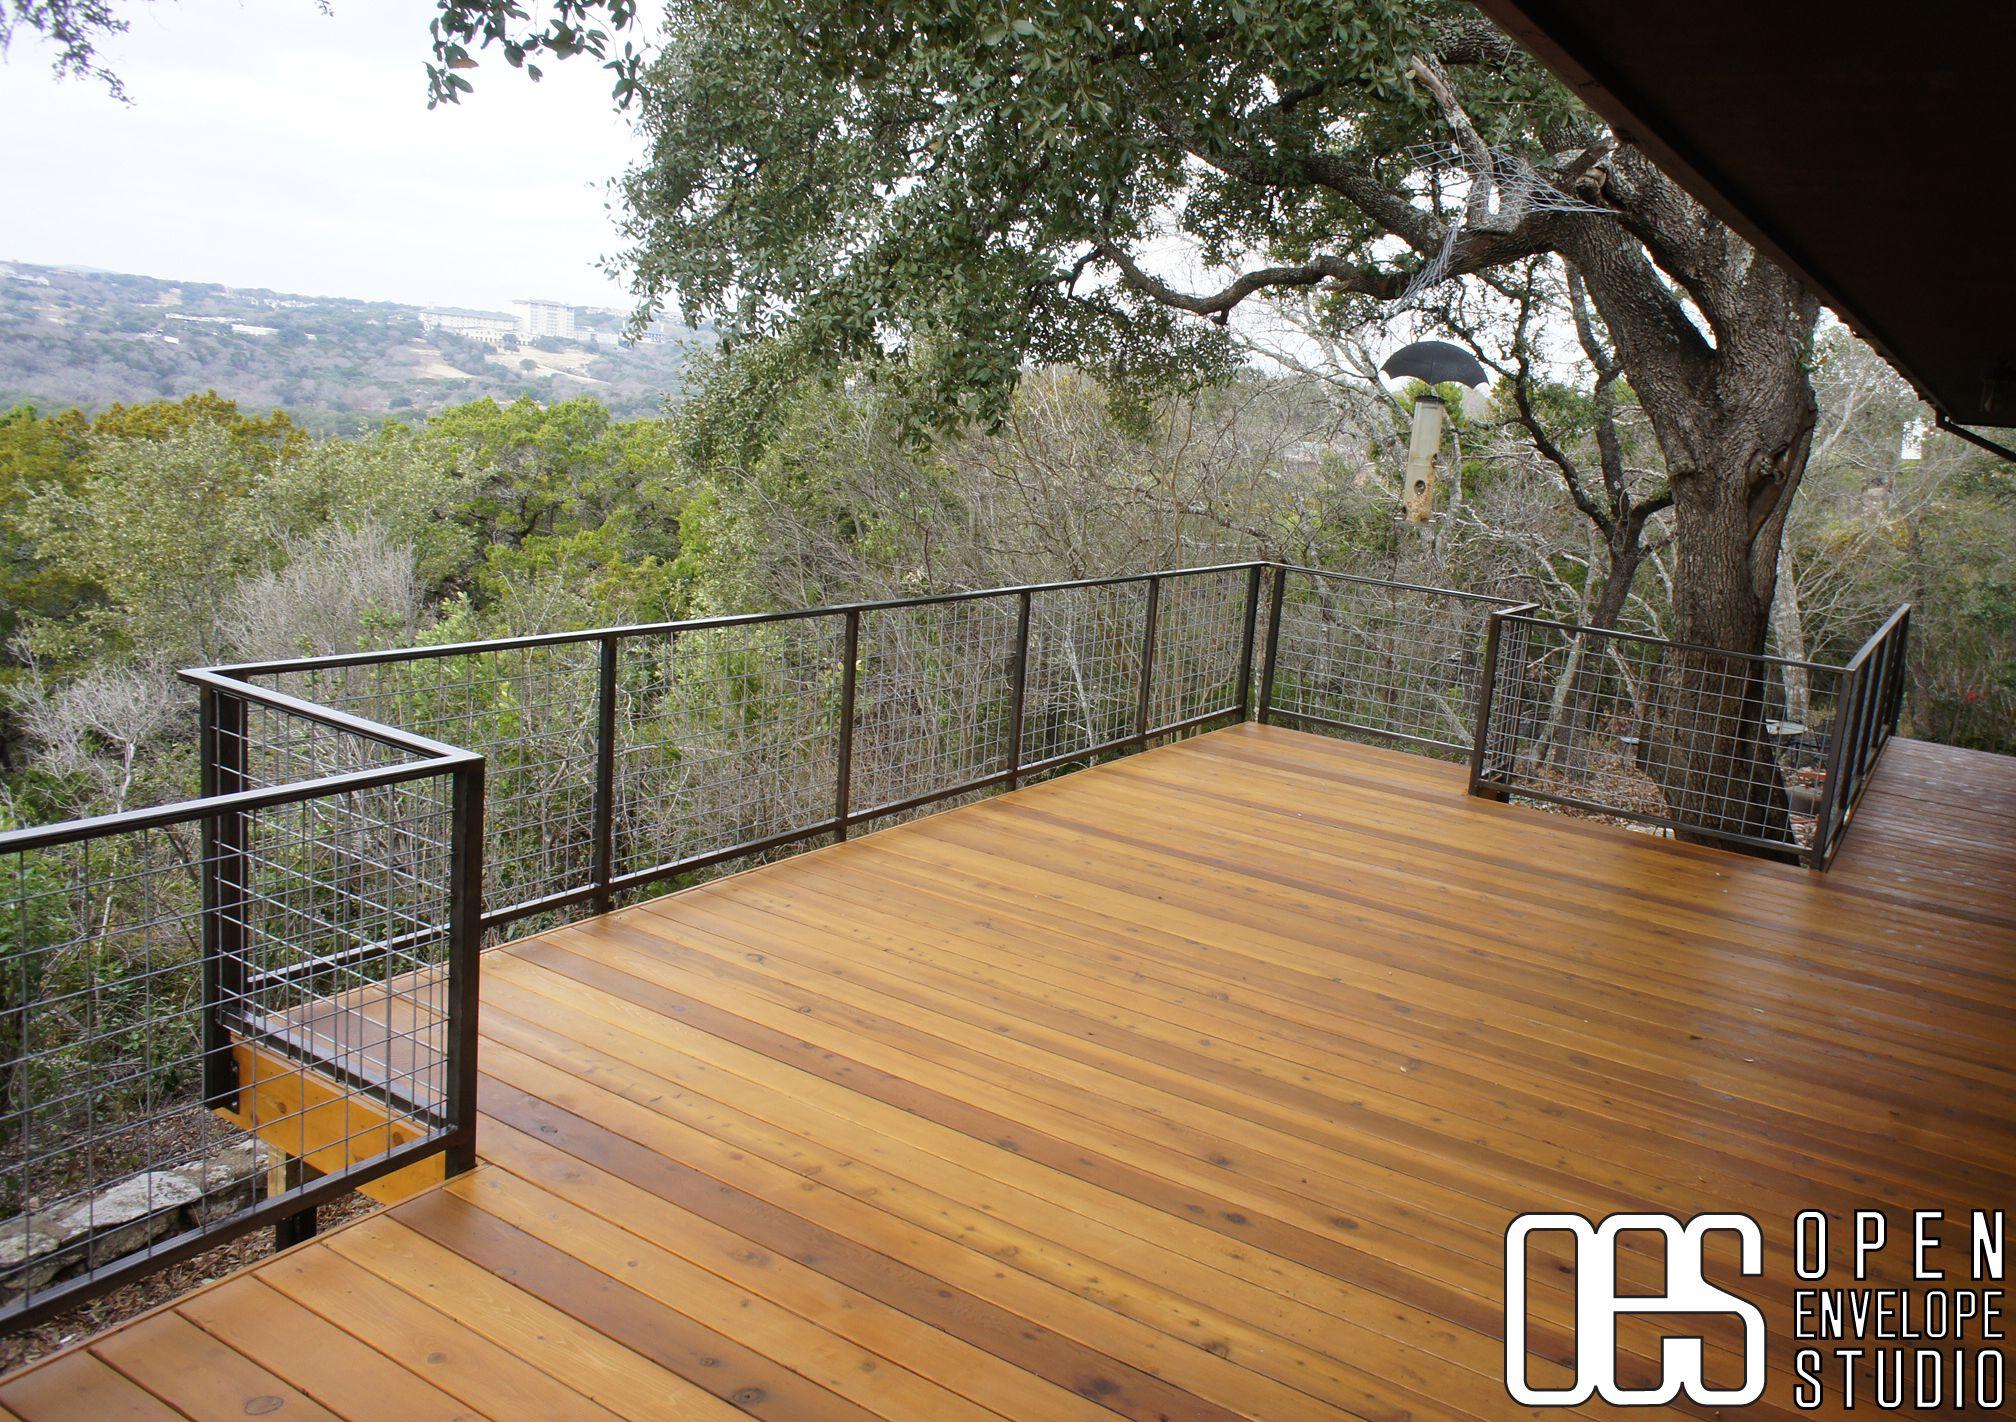 Posts about deck on Open Envelope Studio | Deck, Deck